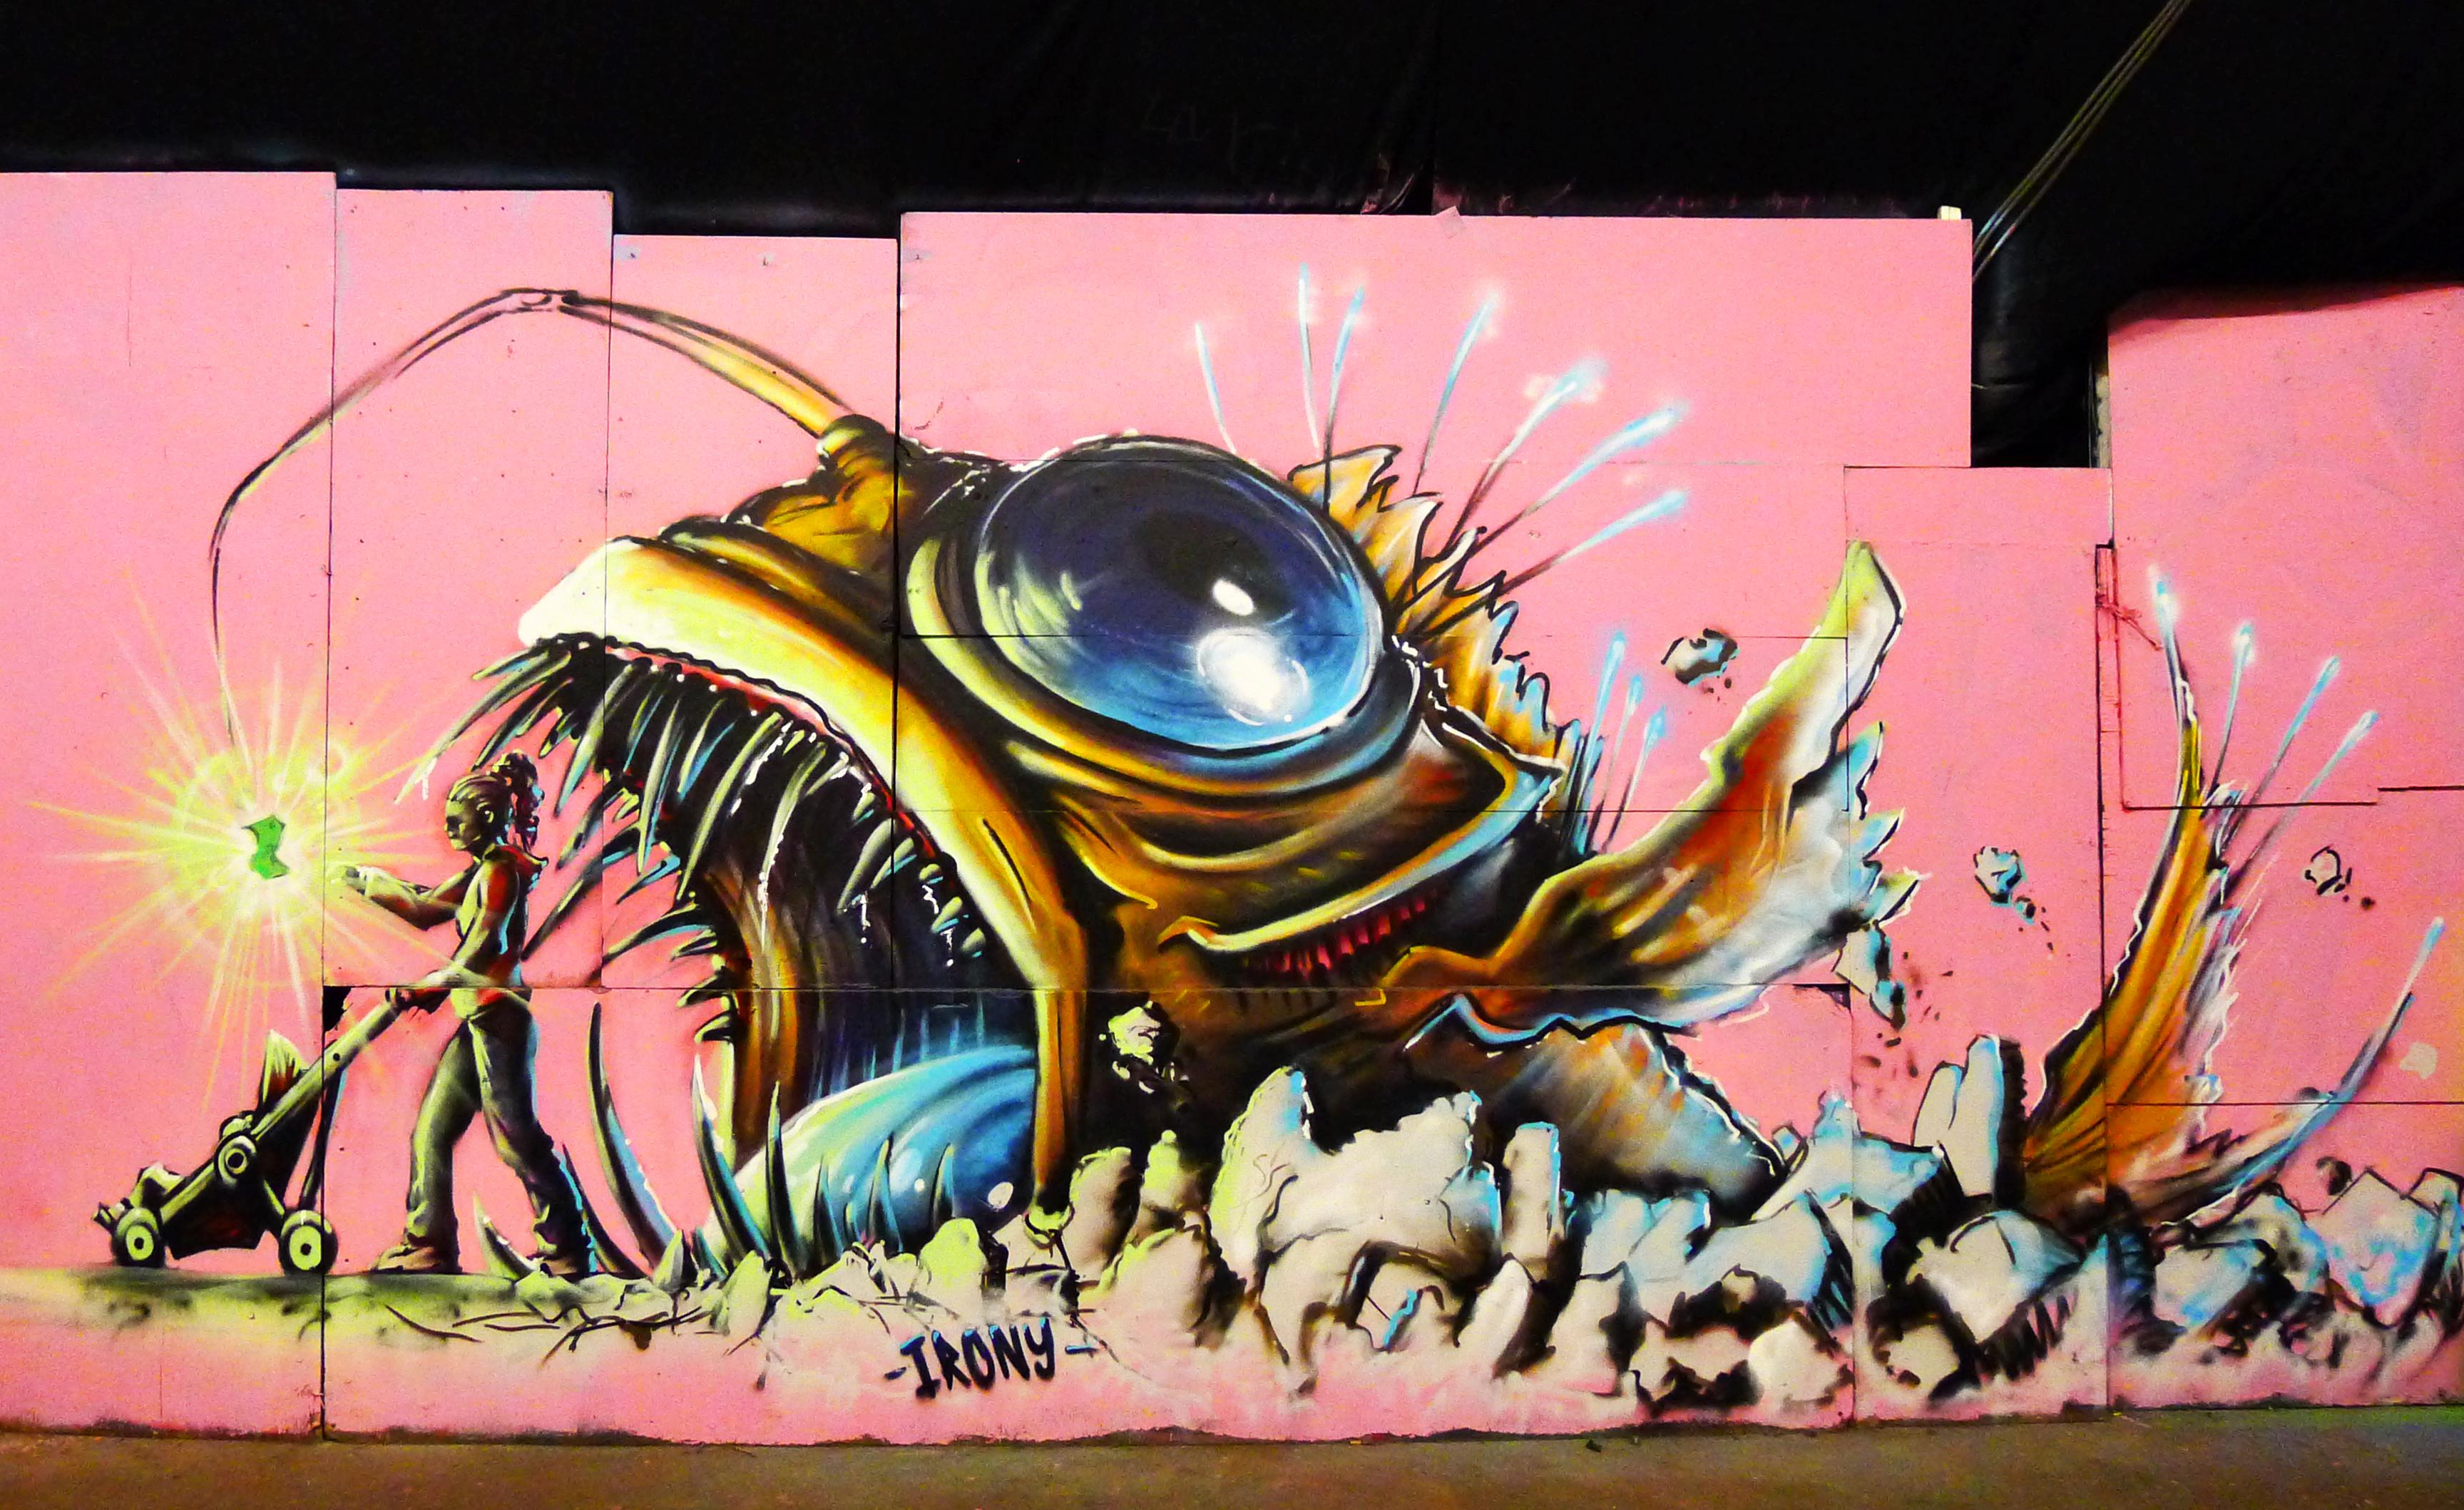 Wonga fish by WhoAm-Irony